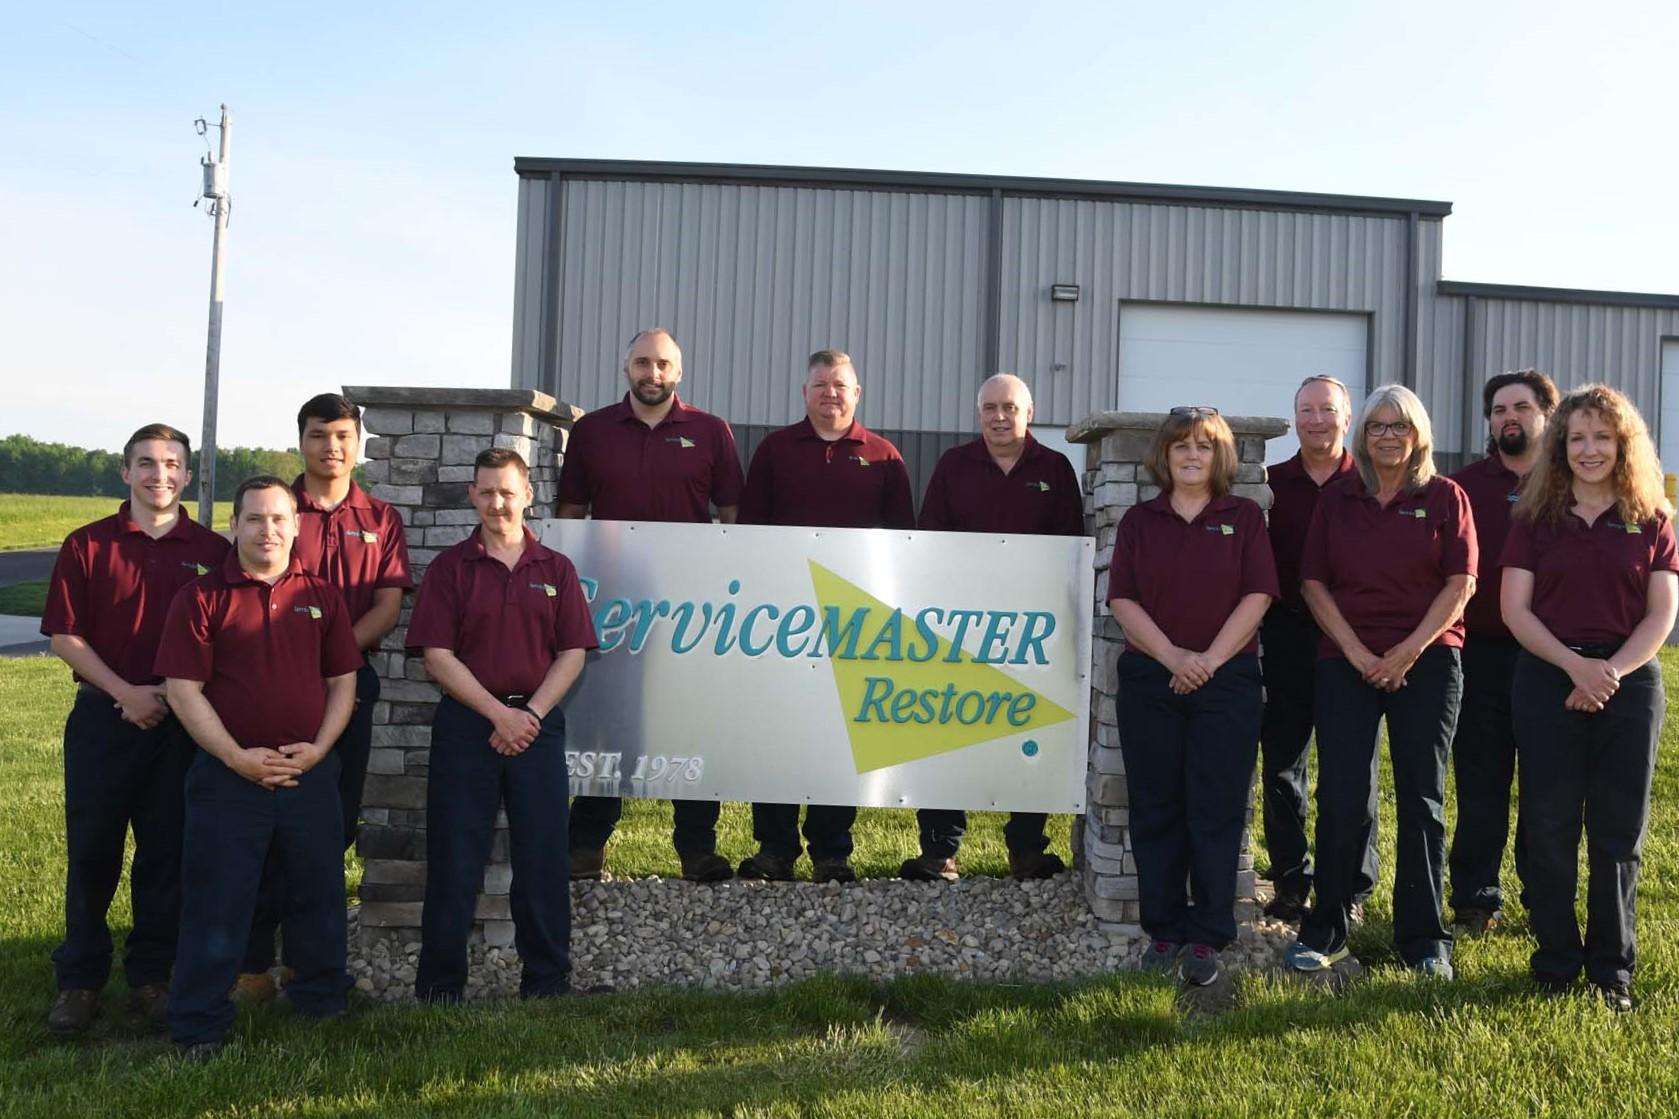 ServiceMaster team picture